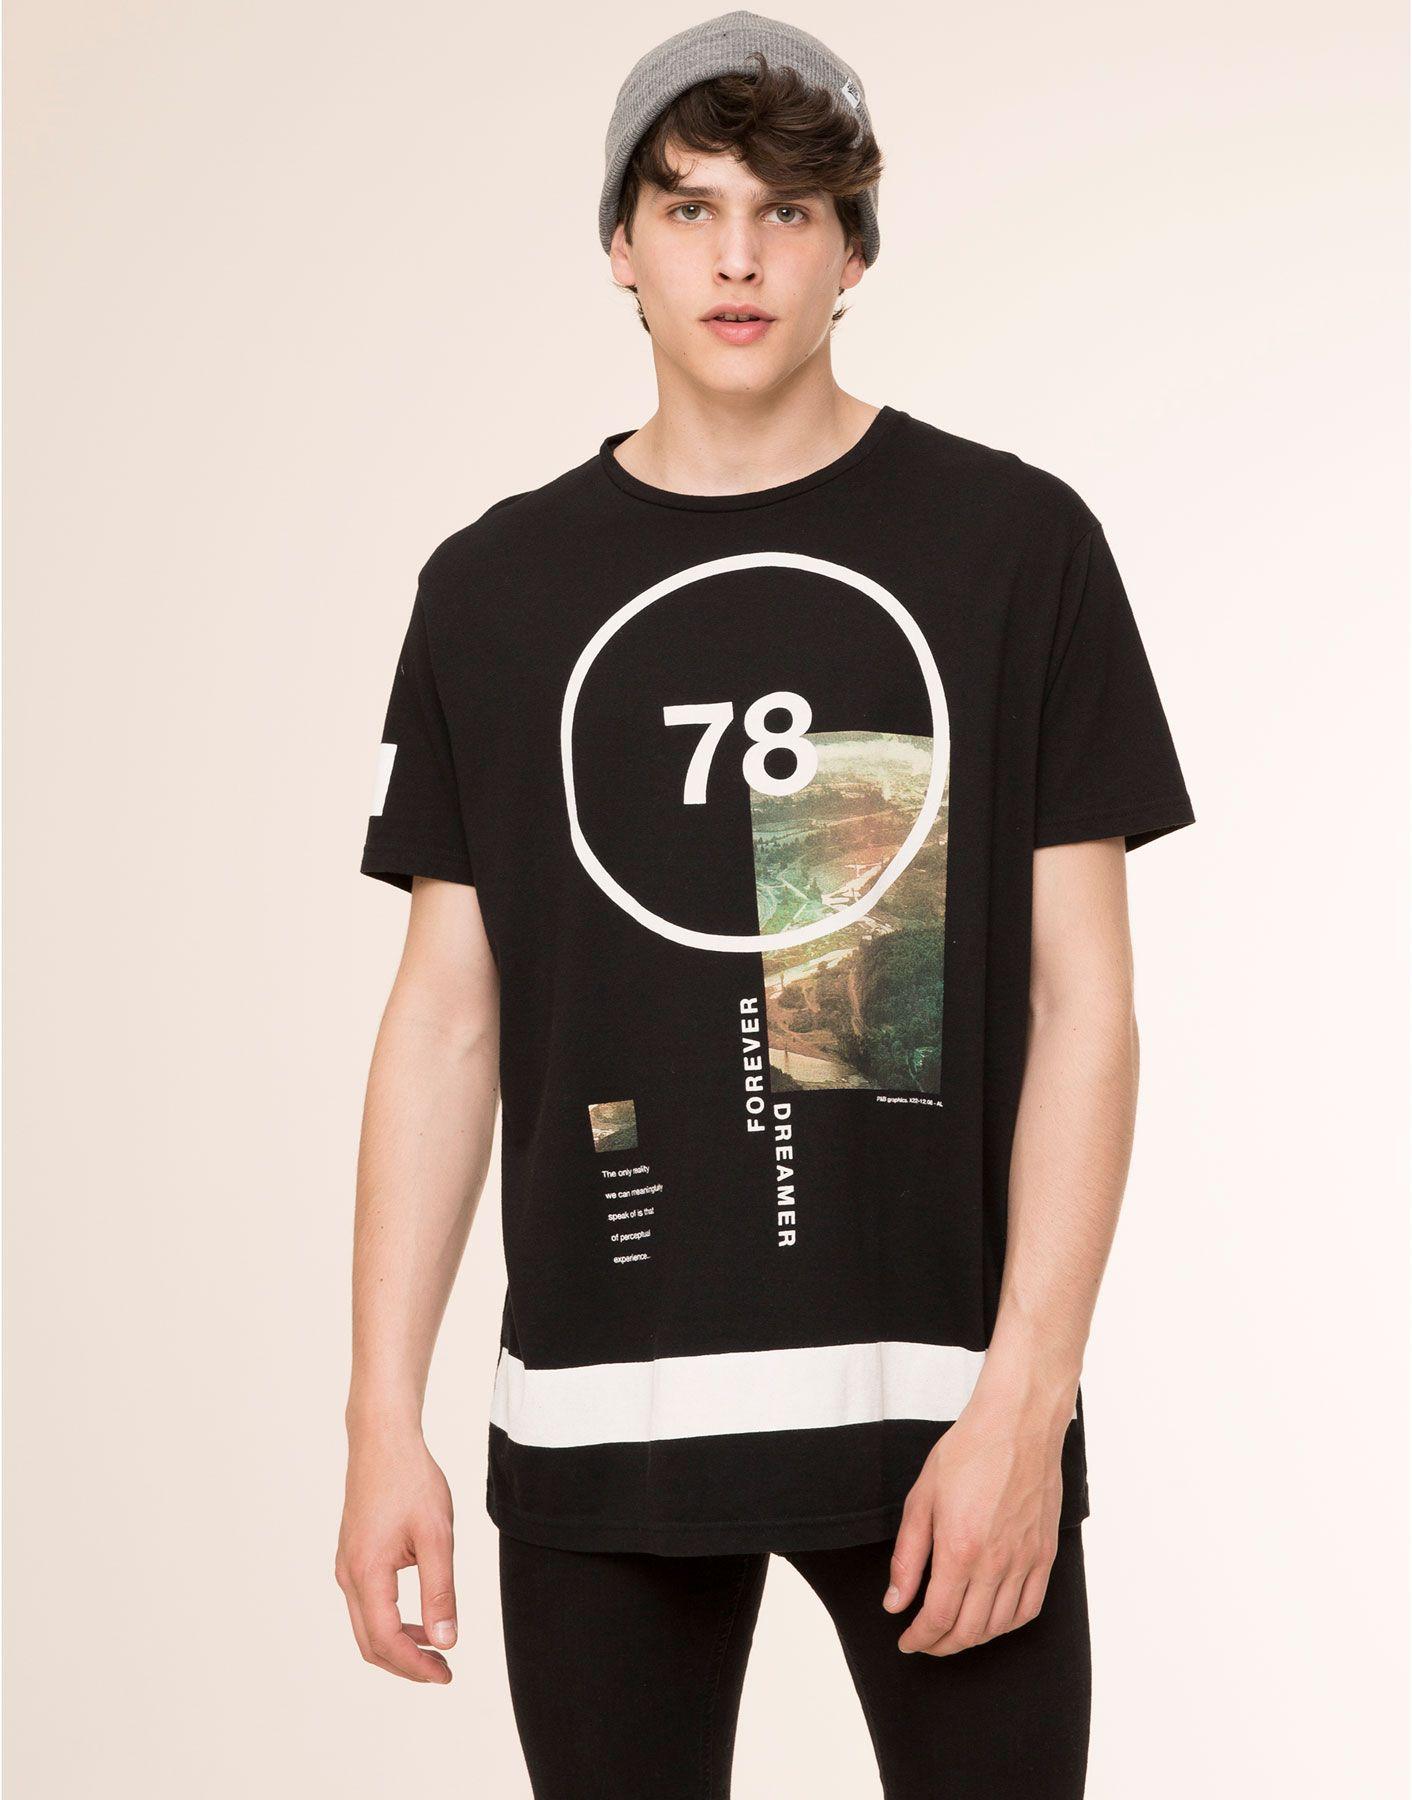 Hombre Manga Camiseta Corta amp;bear España Camisetas Print Pull zIrrxnSdqW